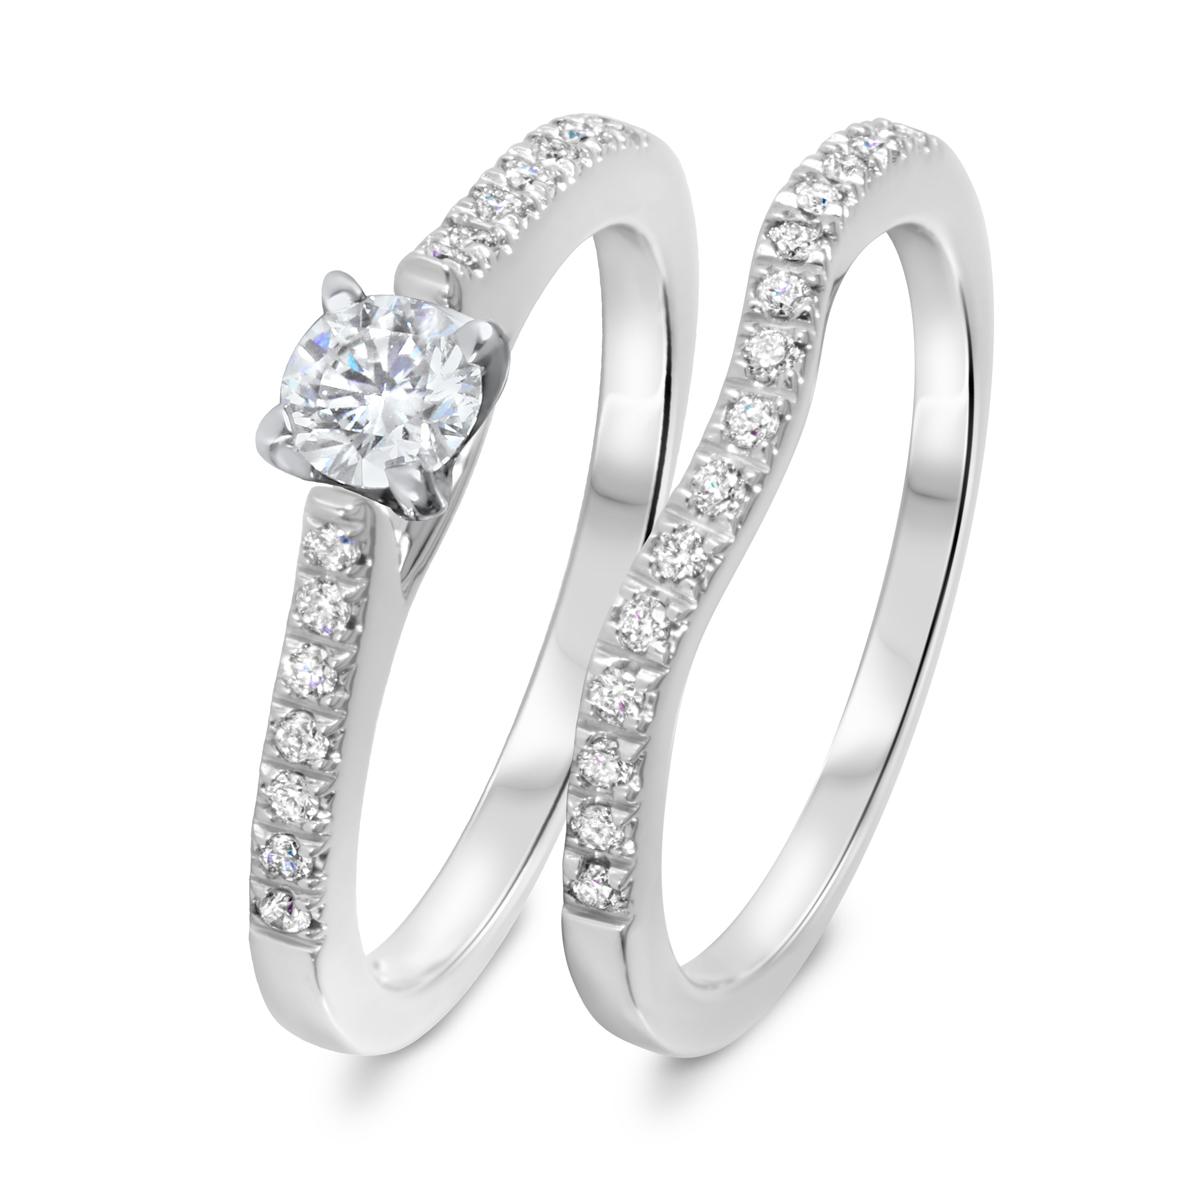 1/2 CT. T.W. Diamond Women's Bridal Wedding Ring Set 14K White Gold